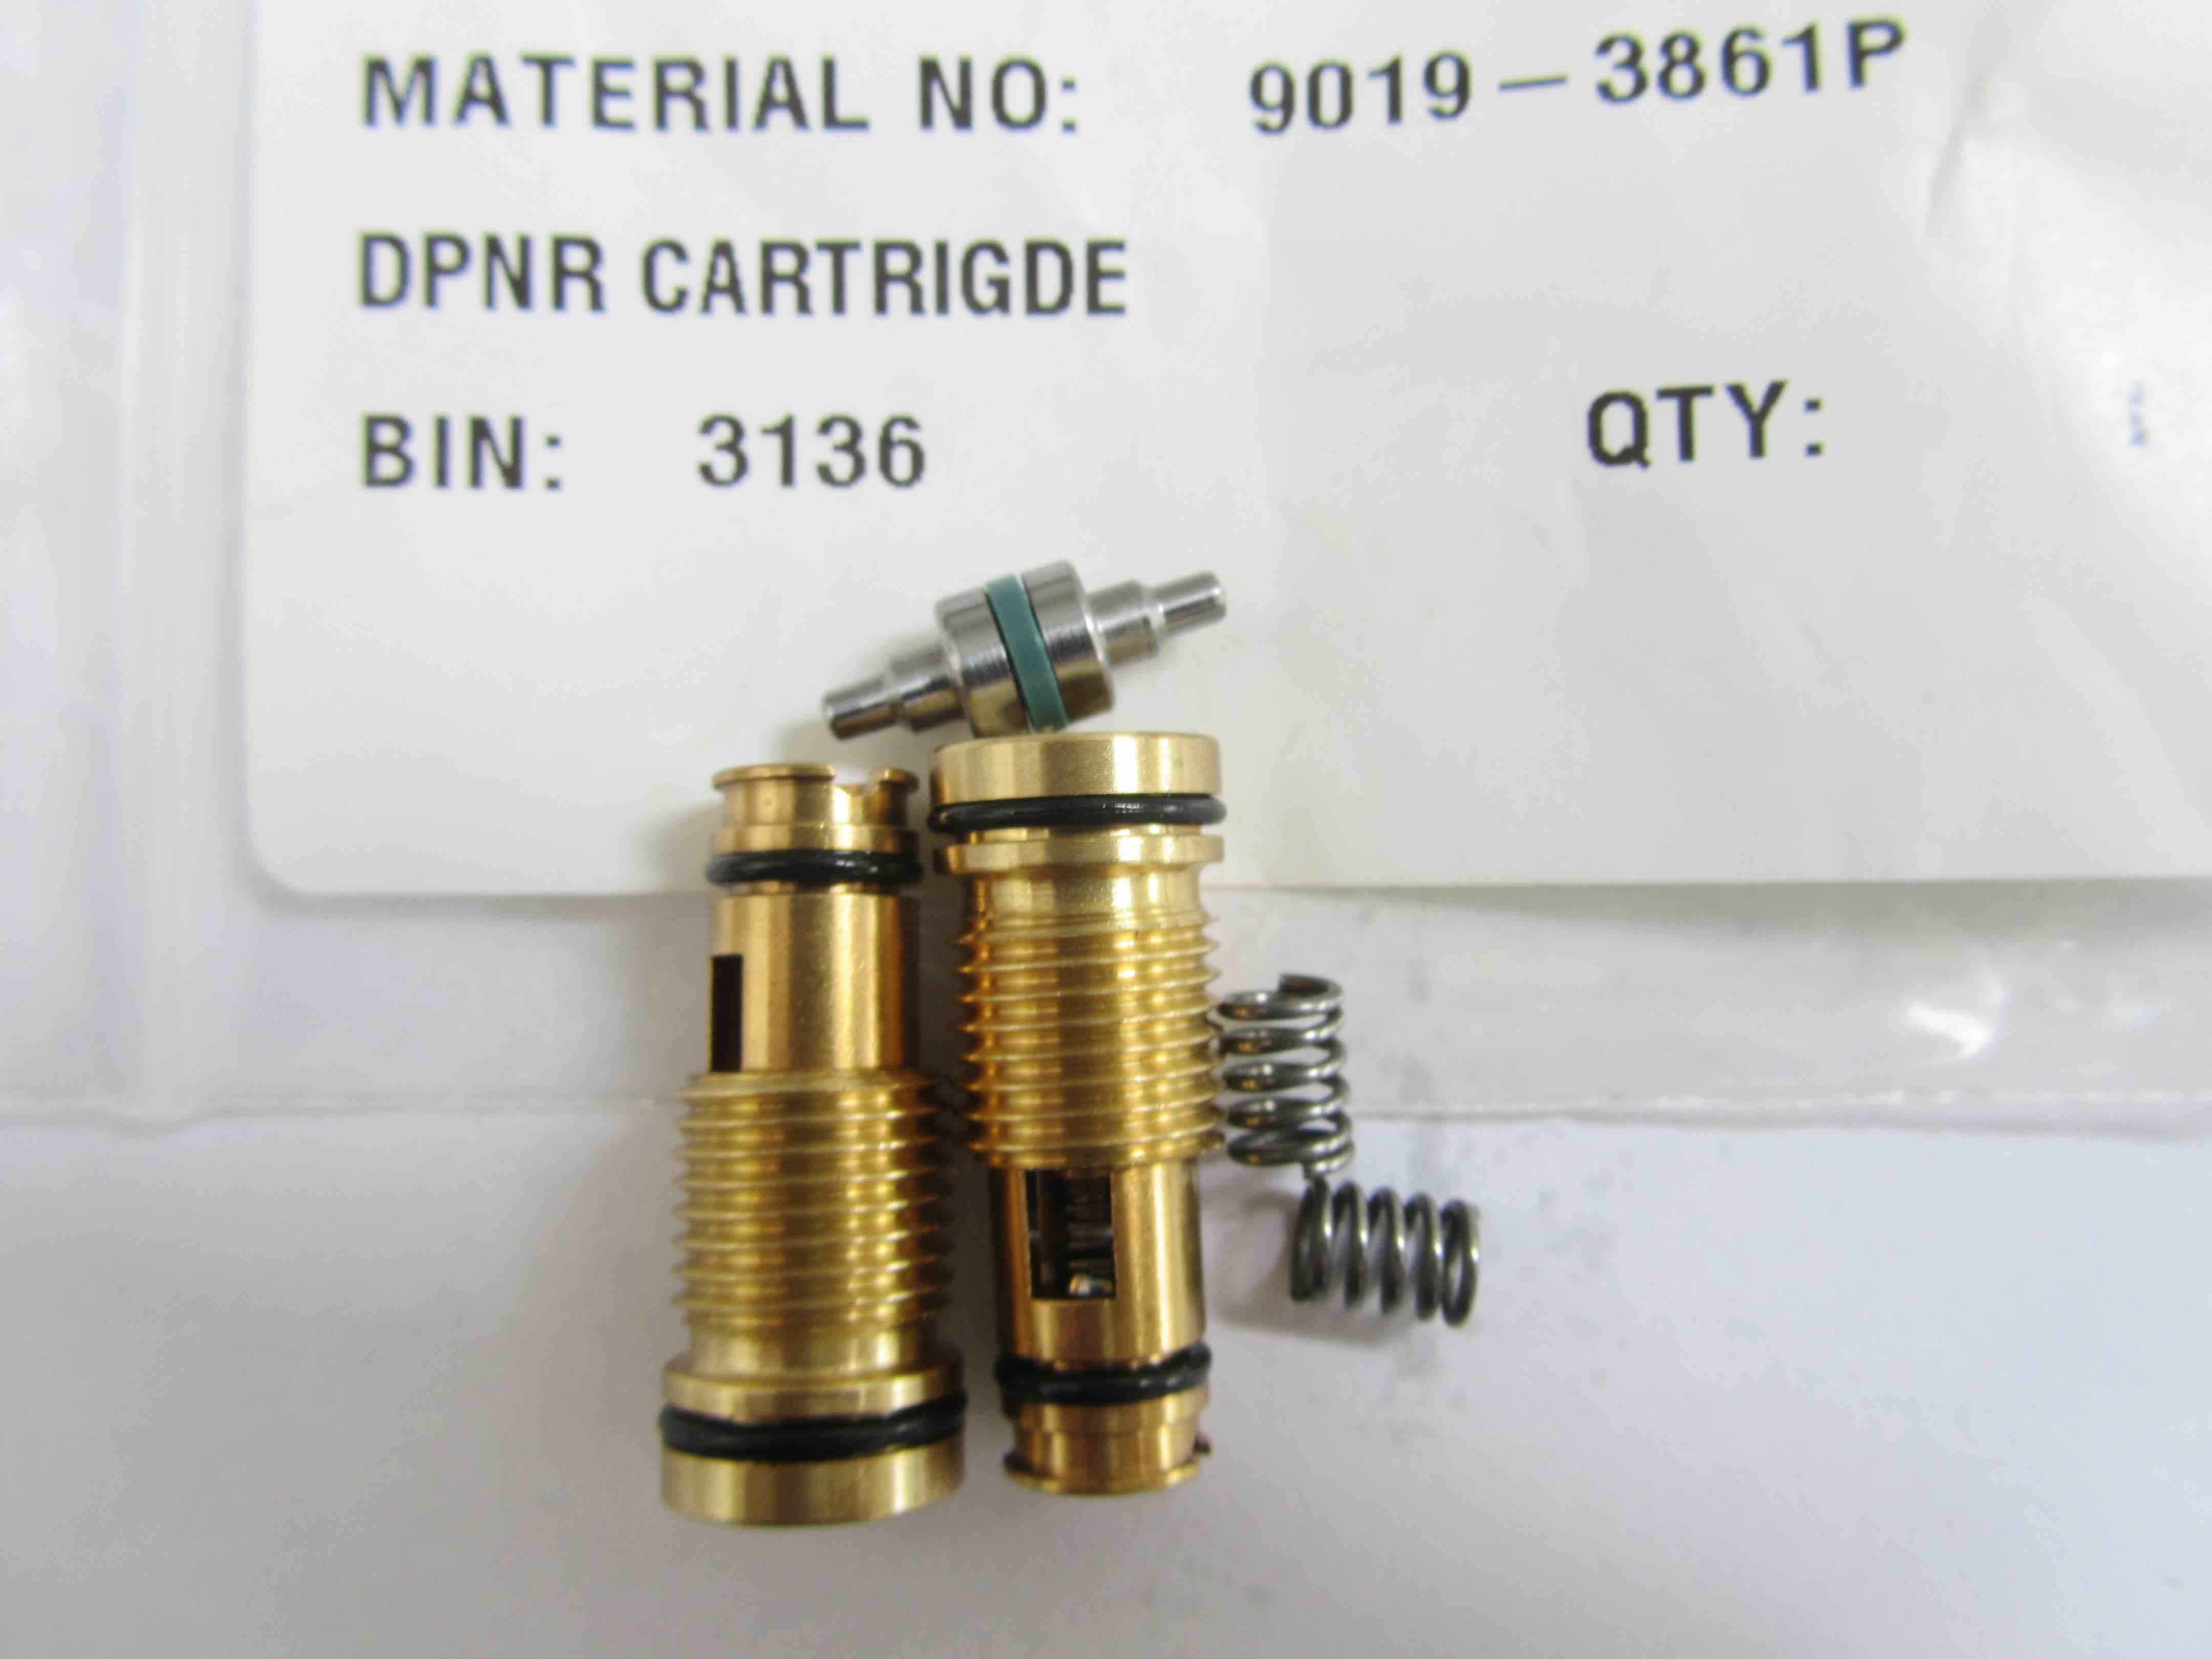 9019-3861:P Cartridge